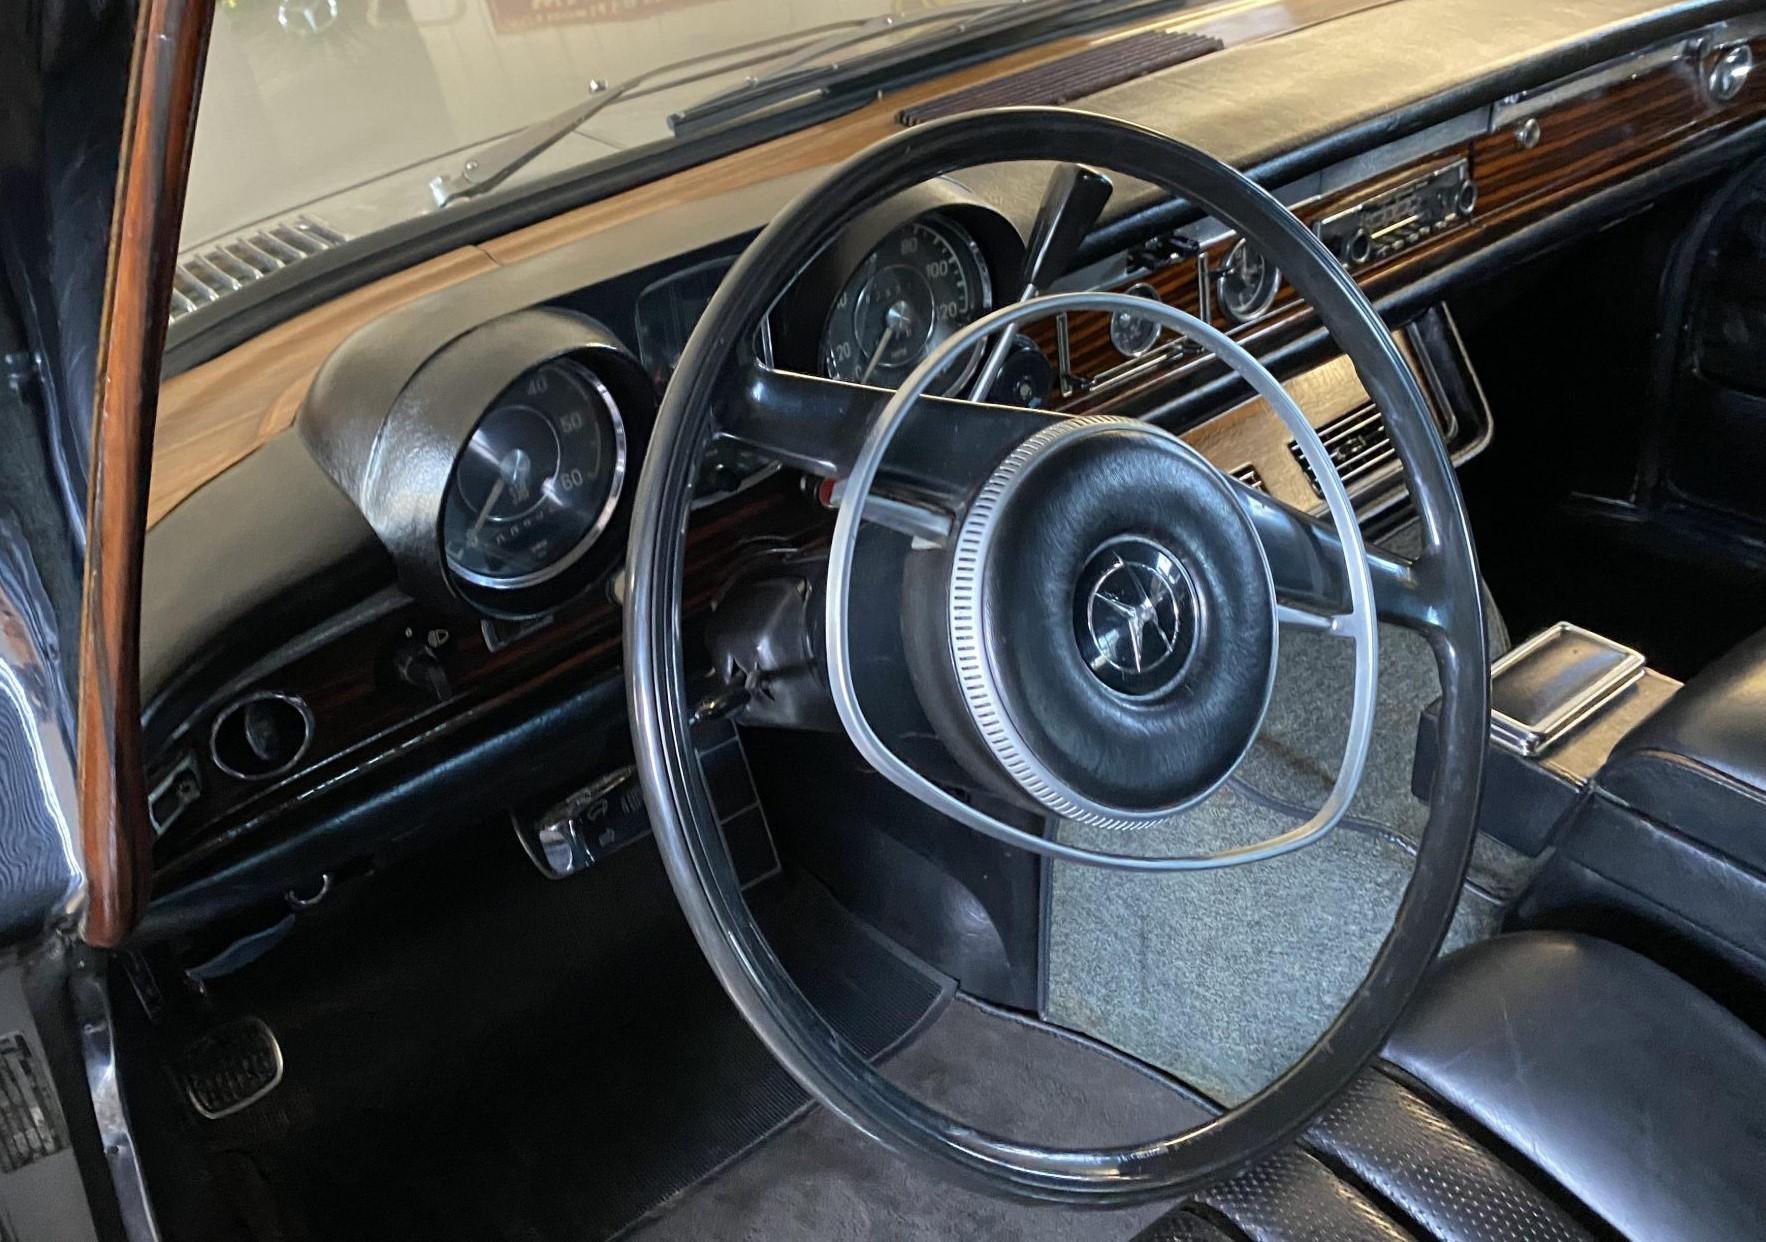 1969 Mercedes-Benz 600 Elvis car interior steering wheel